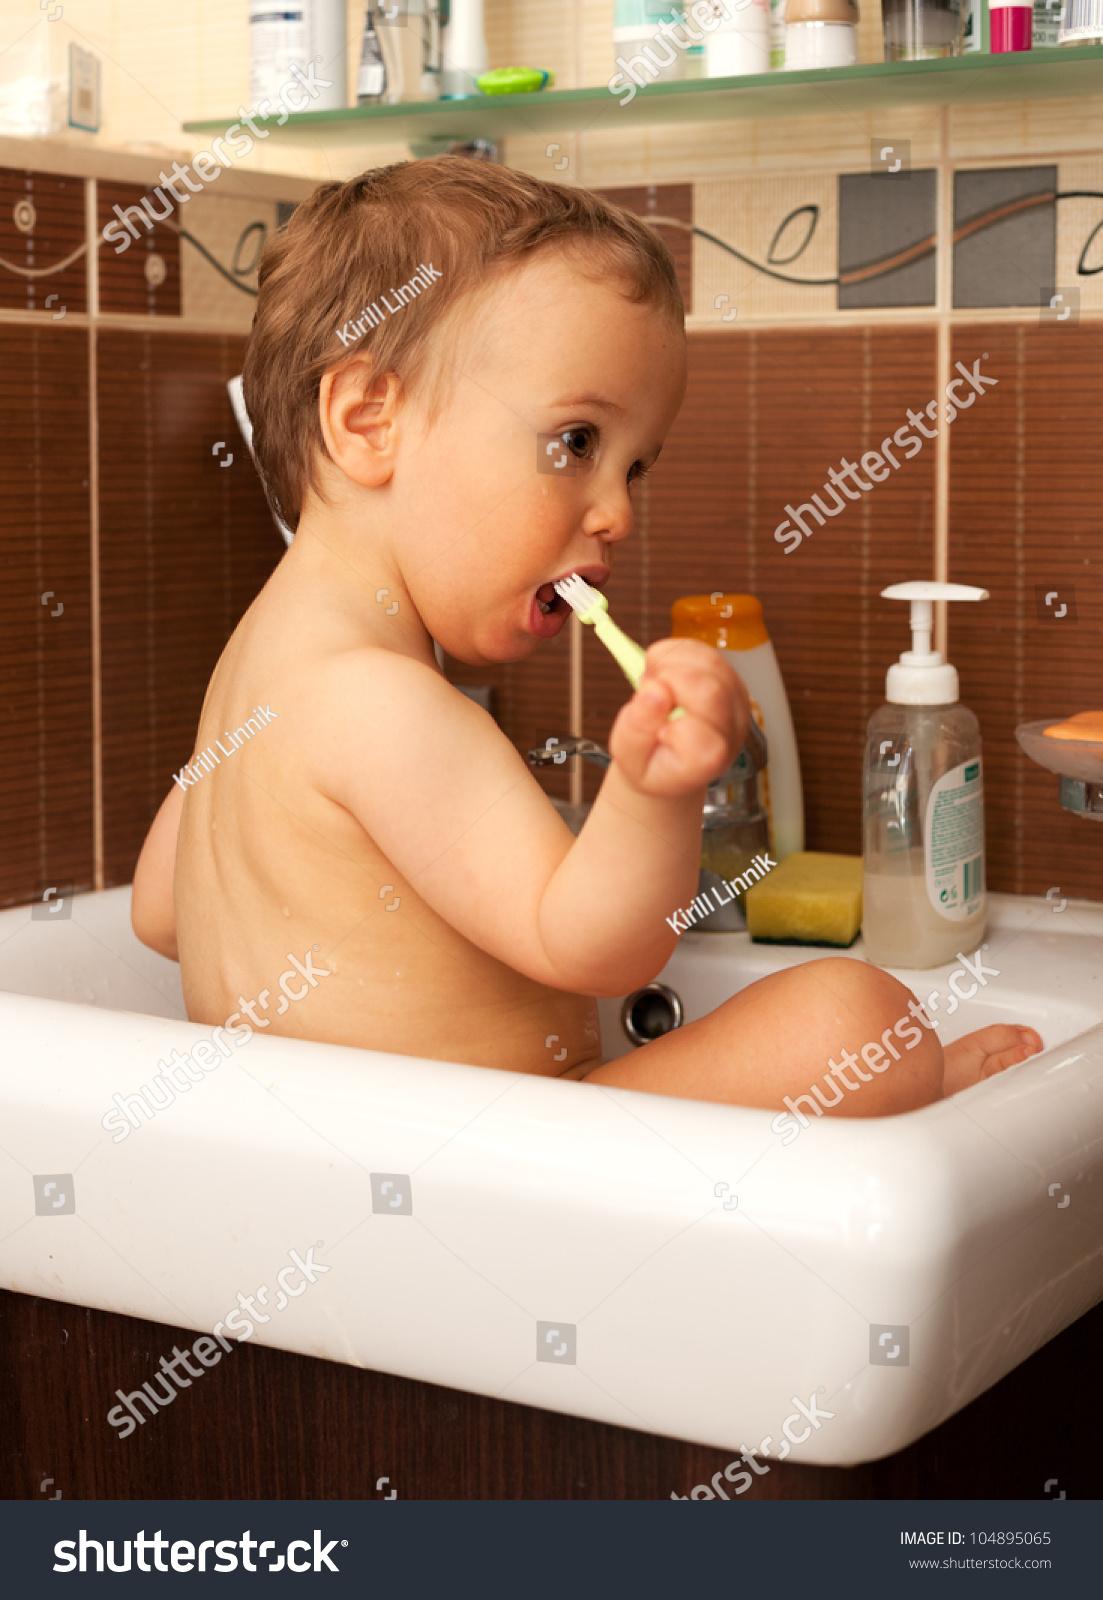 Fine How To Paint A Bathtub Thick Painting A Bathtub Shaped Paint For Bathtub Paint Tub Youthful Bathtub Repair Contractor Yellow Bathtub Refinishing Company